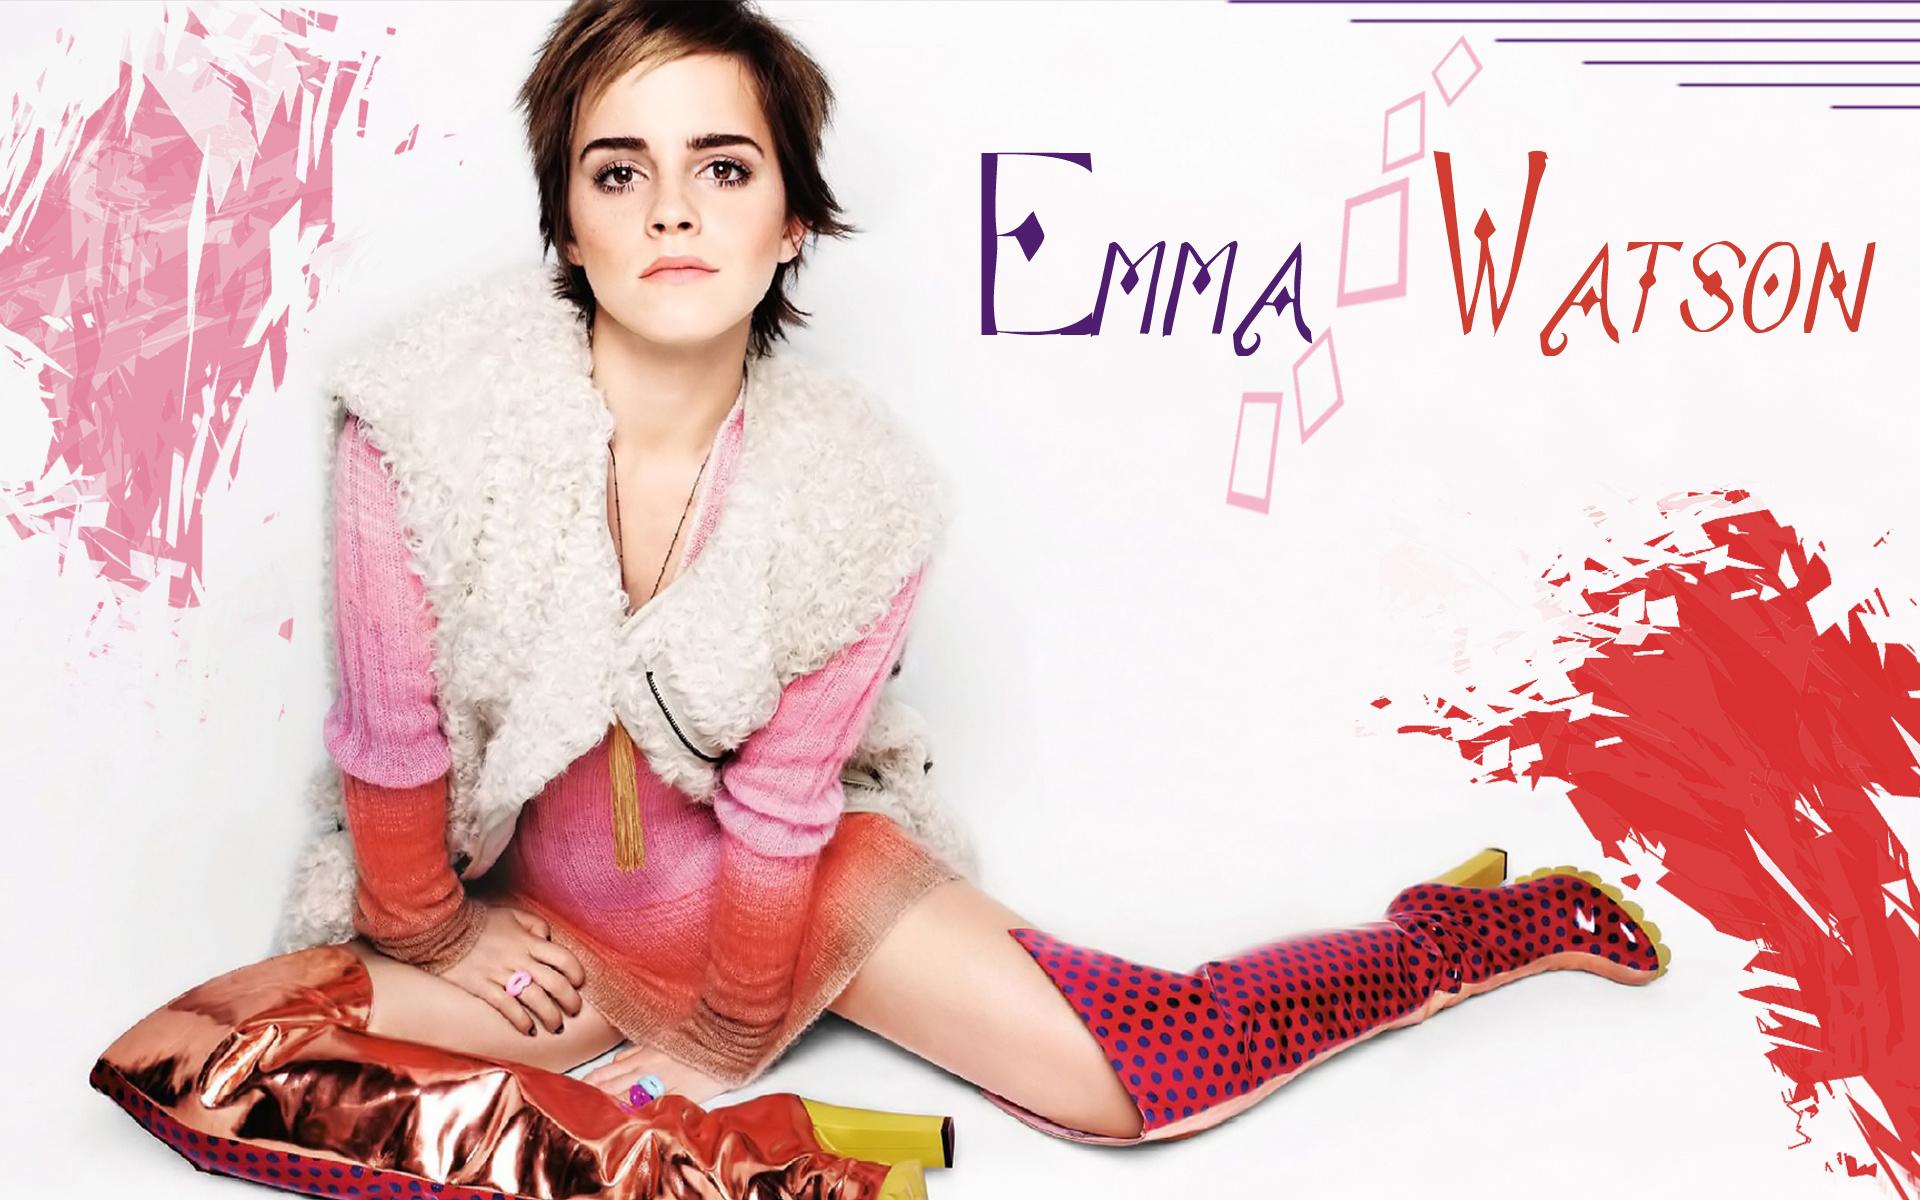 Emma Watson 285 wallpaper